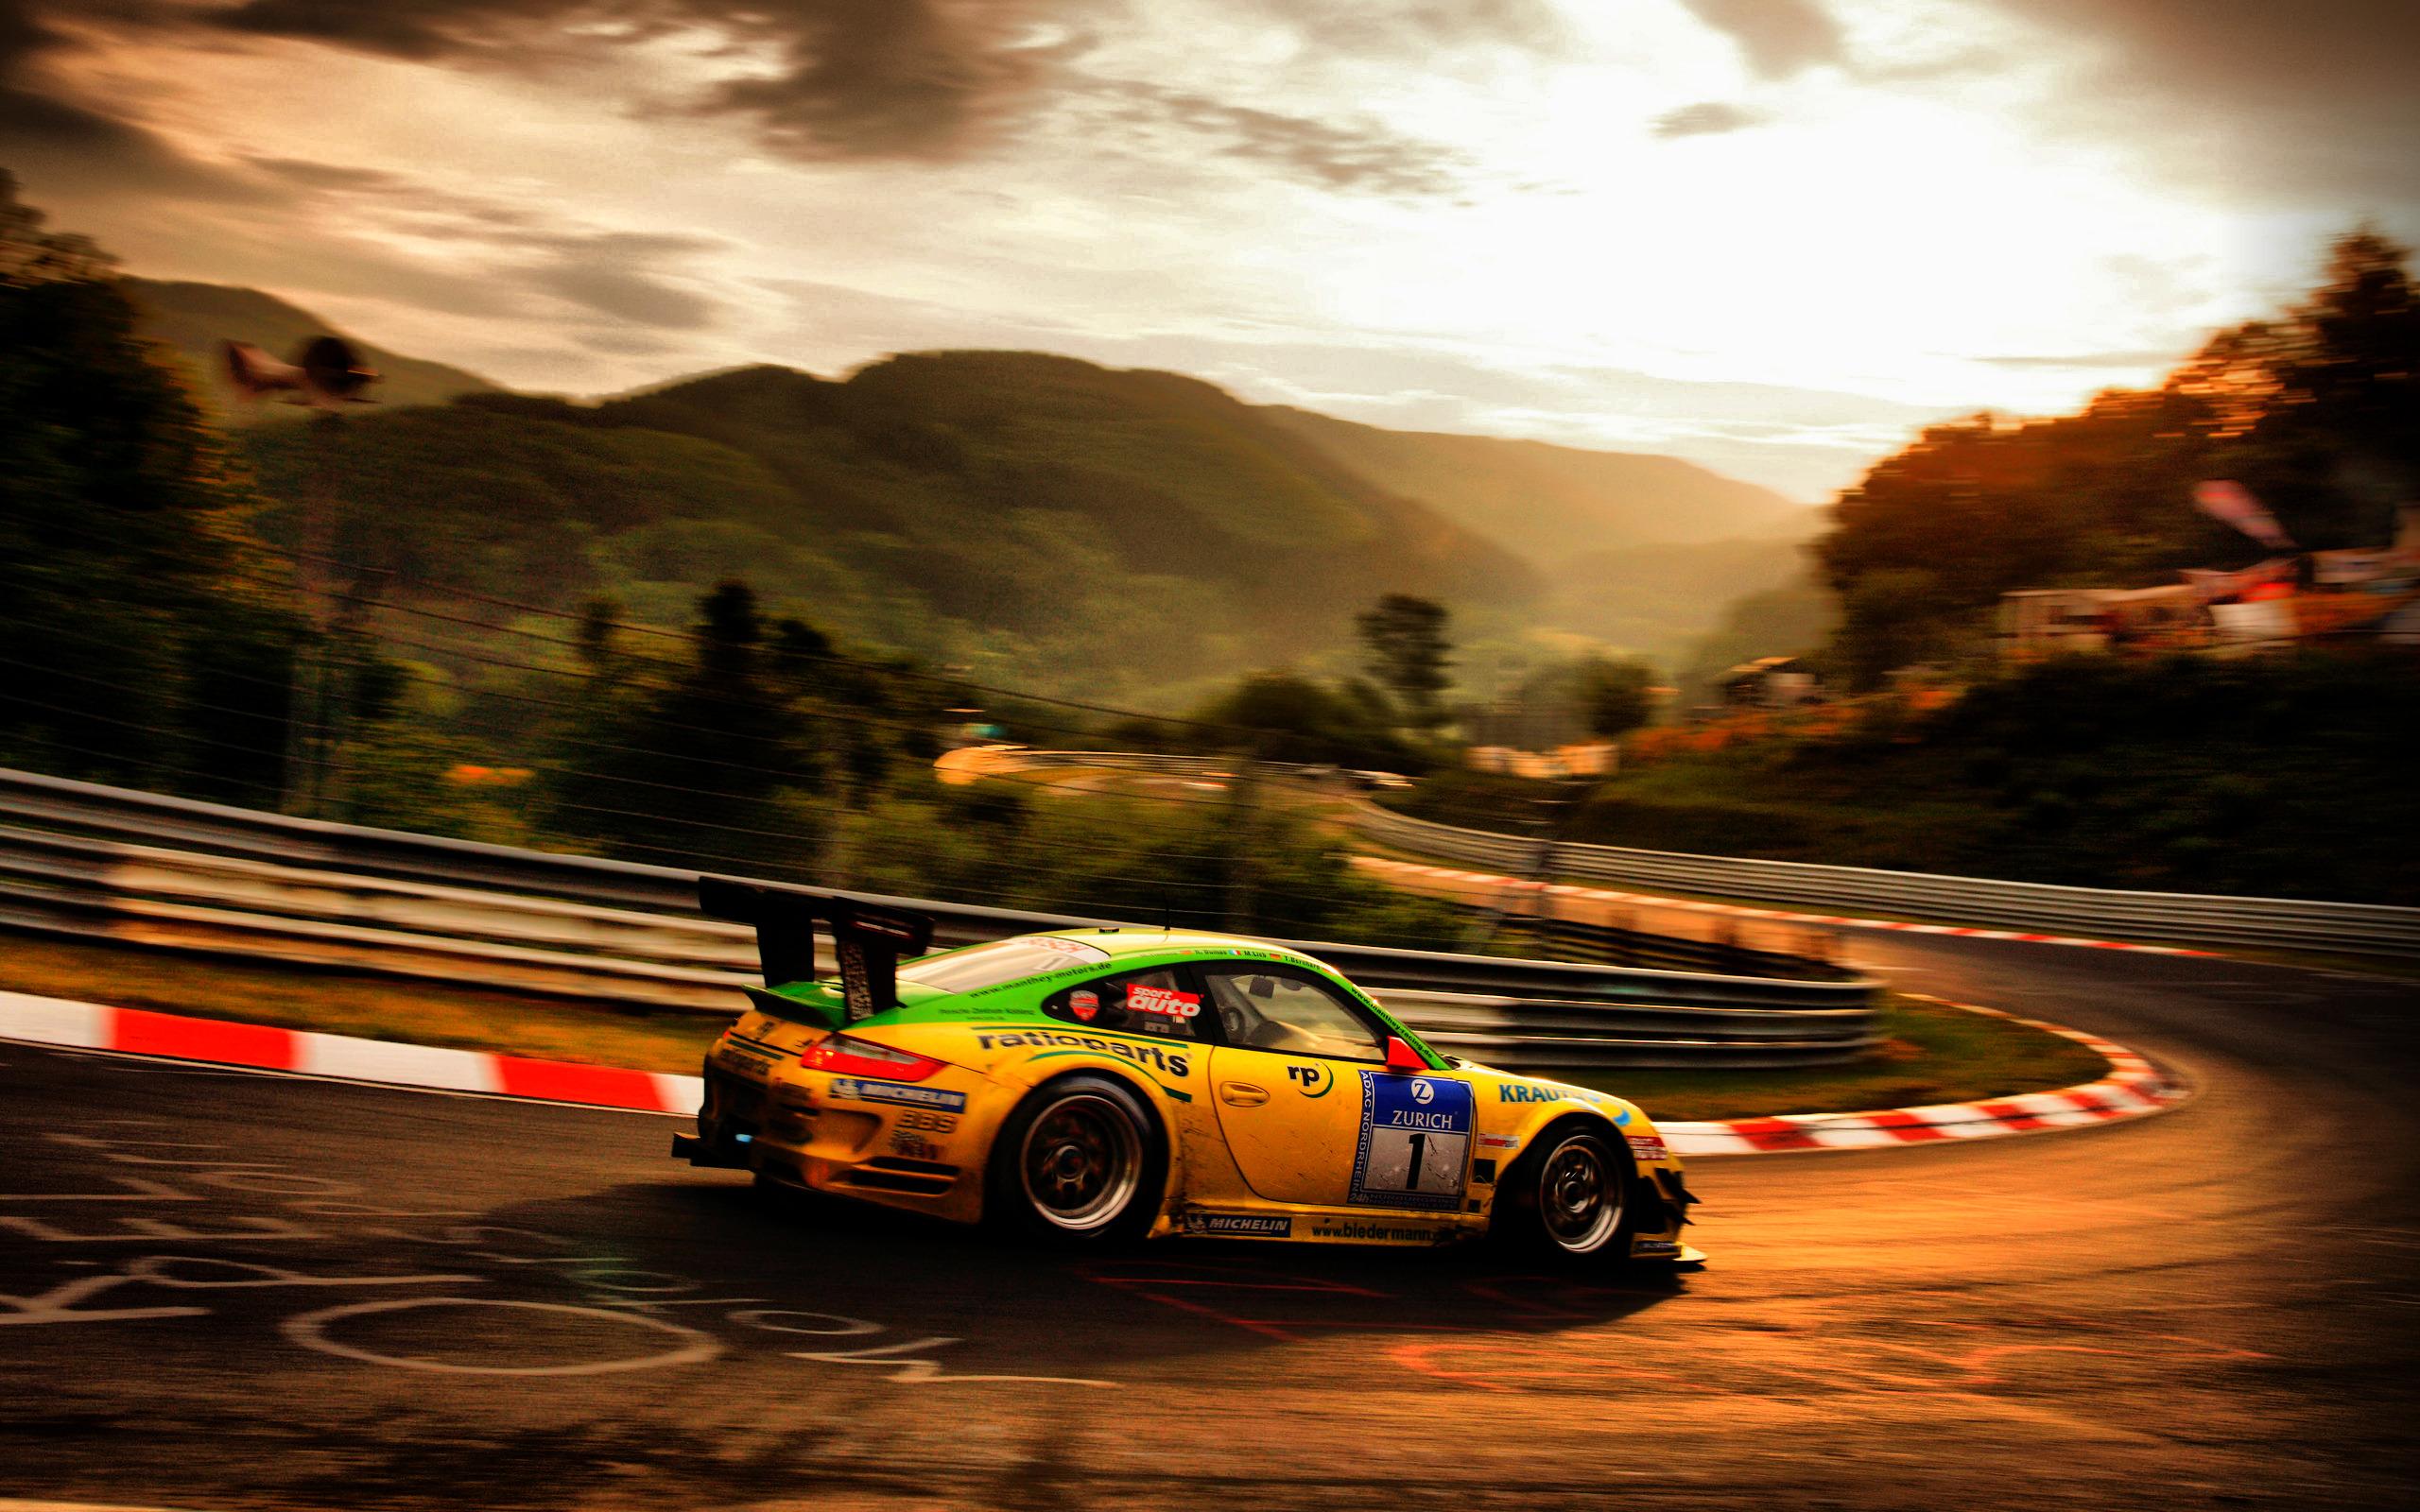 motor sports full hd - photo #37